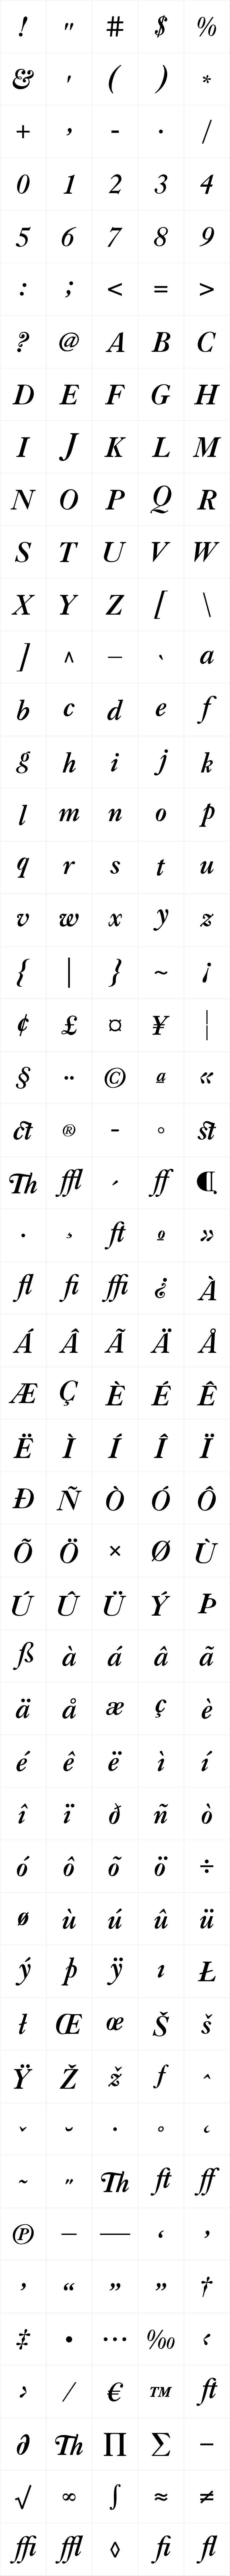 LTC Caslon Long Bold Italic